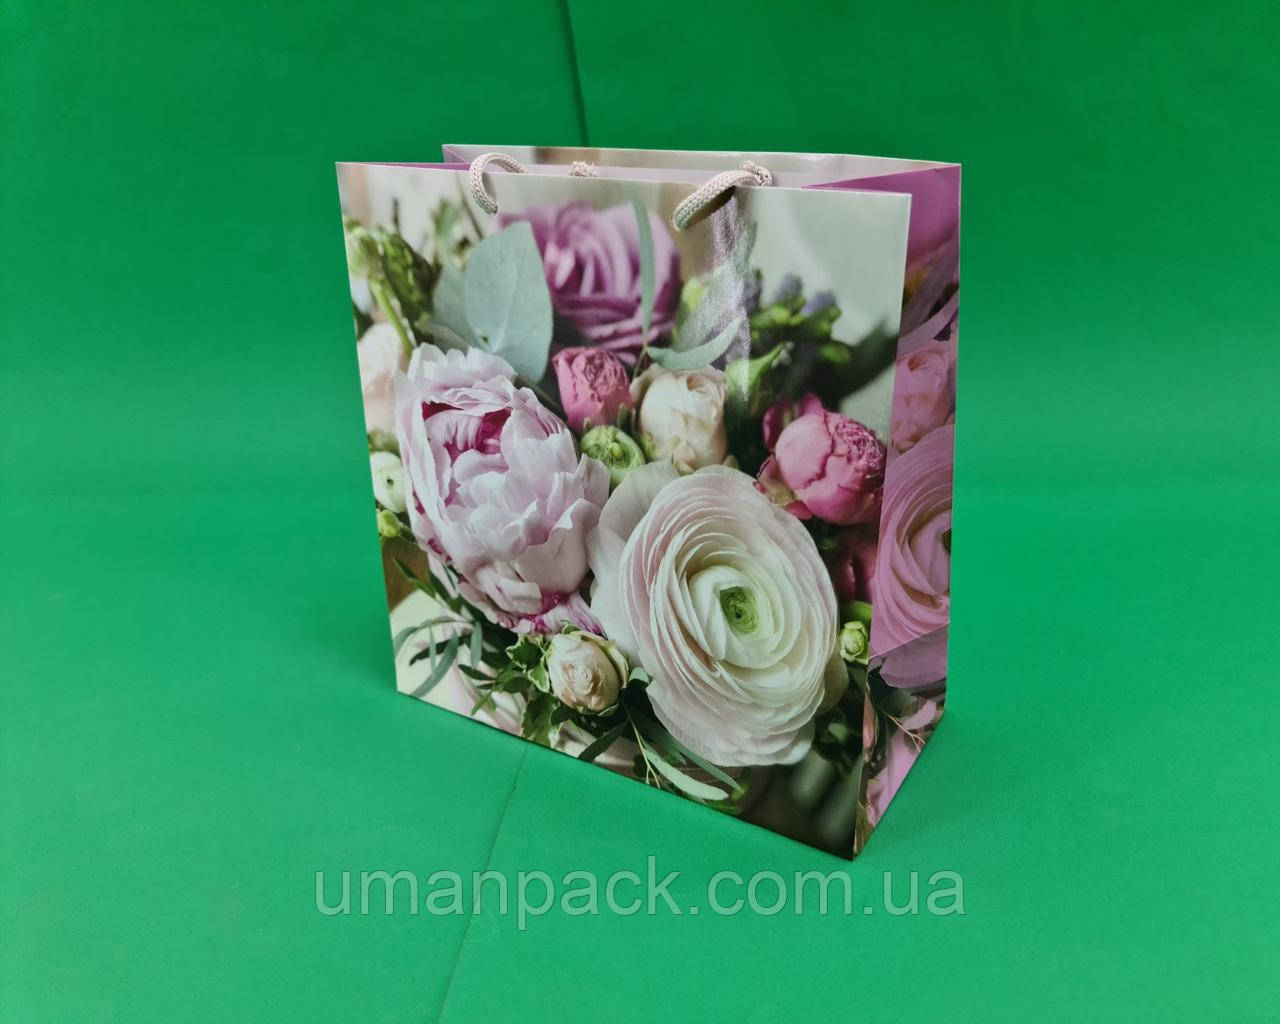 Пакет бумажный подарочный квадратный ы 23*24*10(артKV-007) (12 шт)